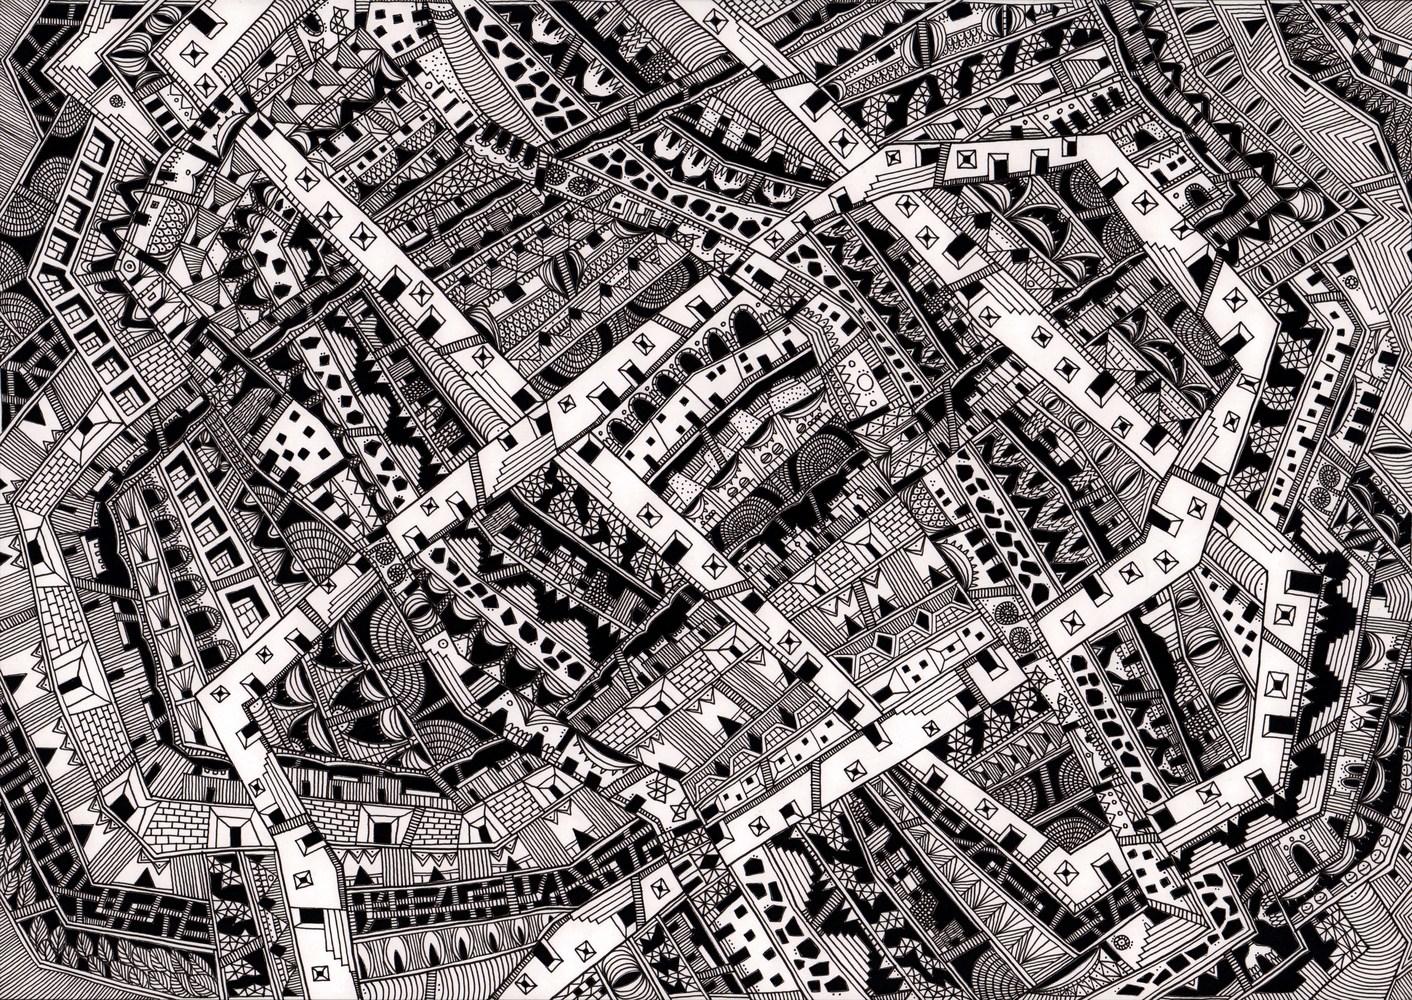 Las Ciudades Invisibles – Ítalo Calvino